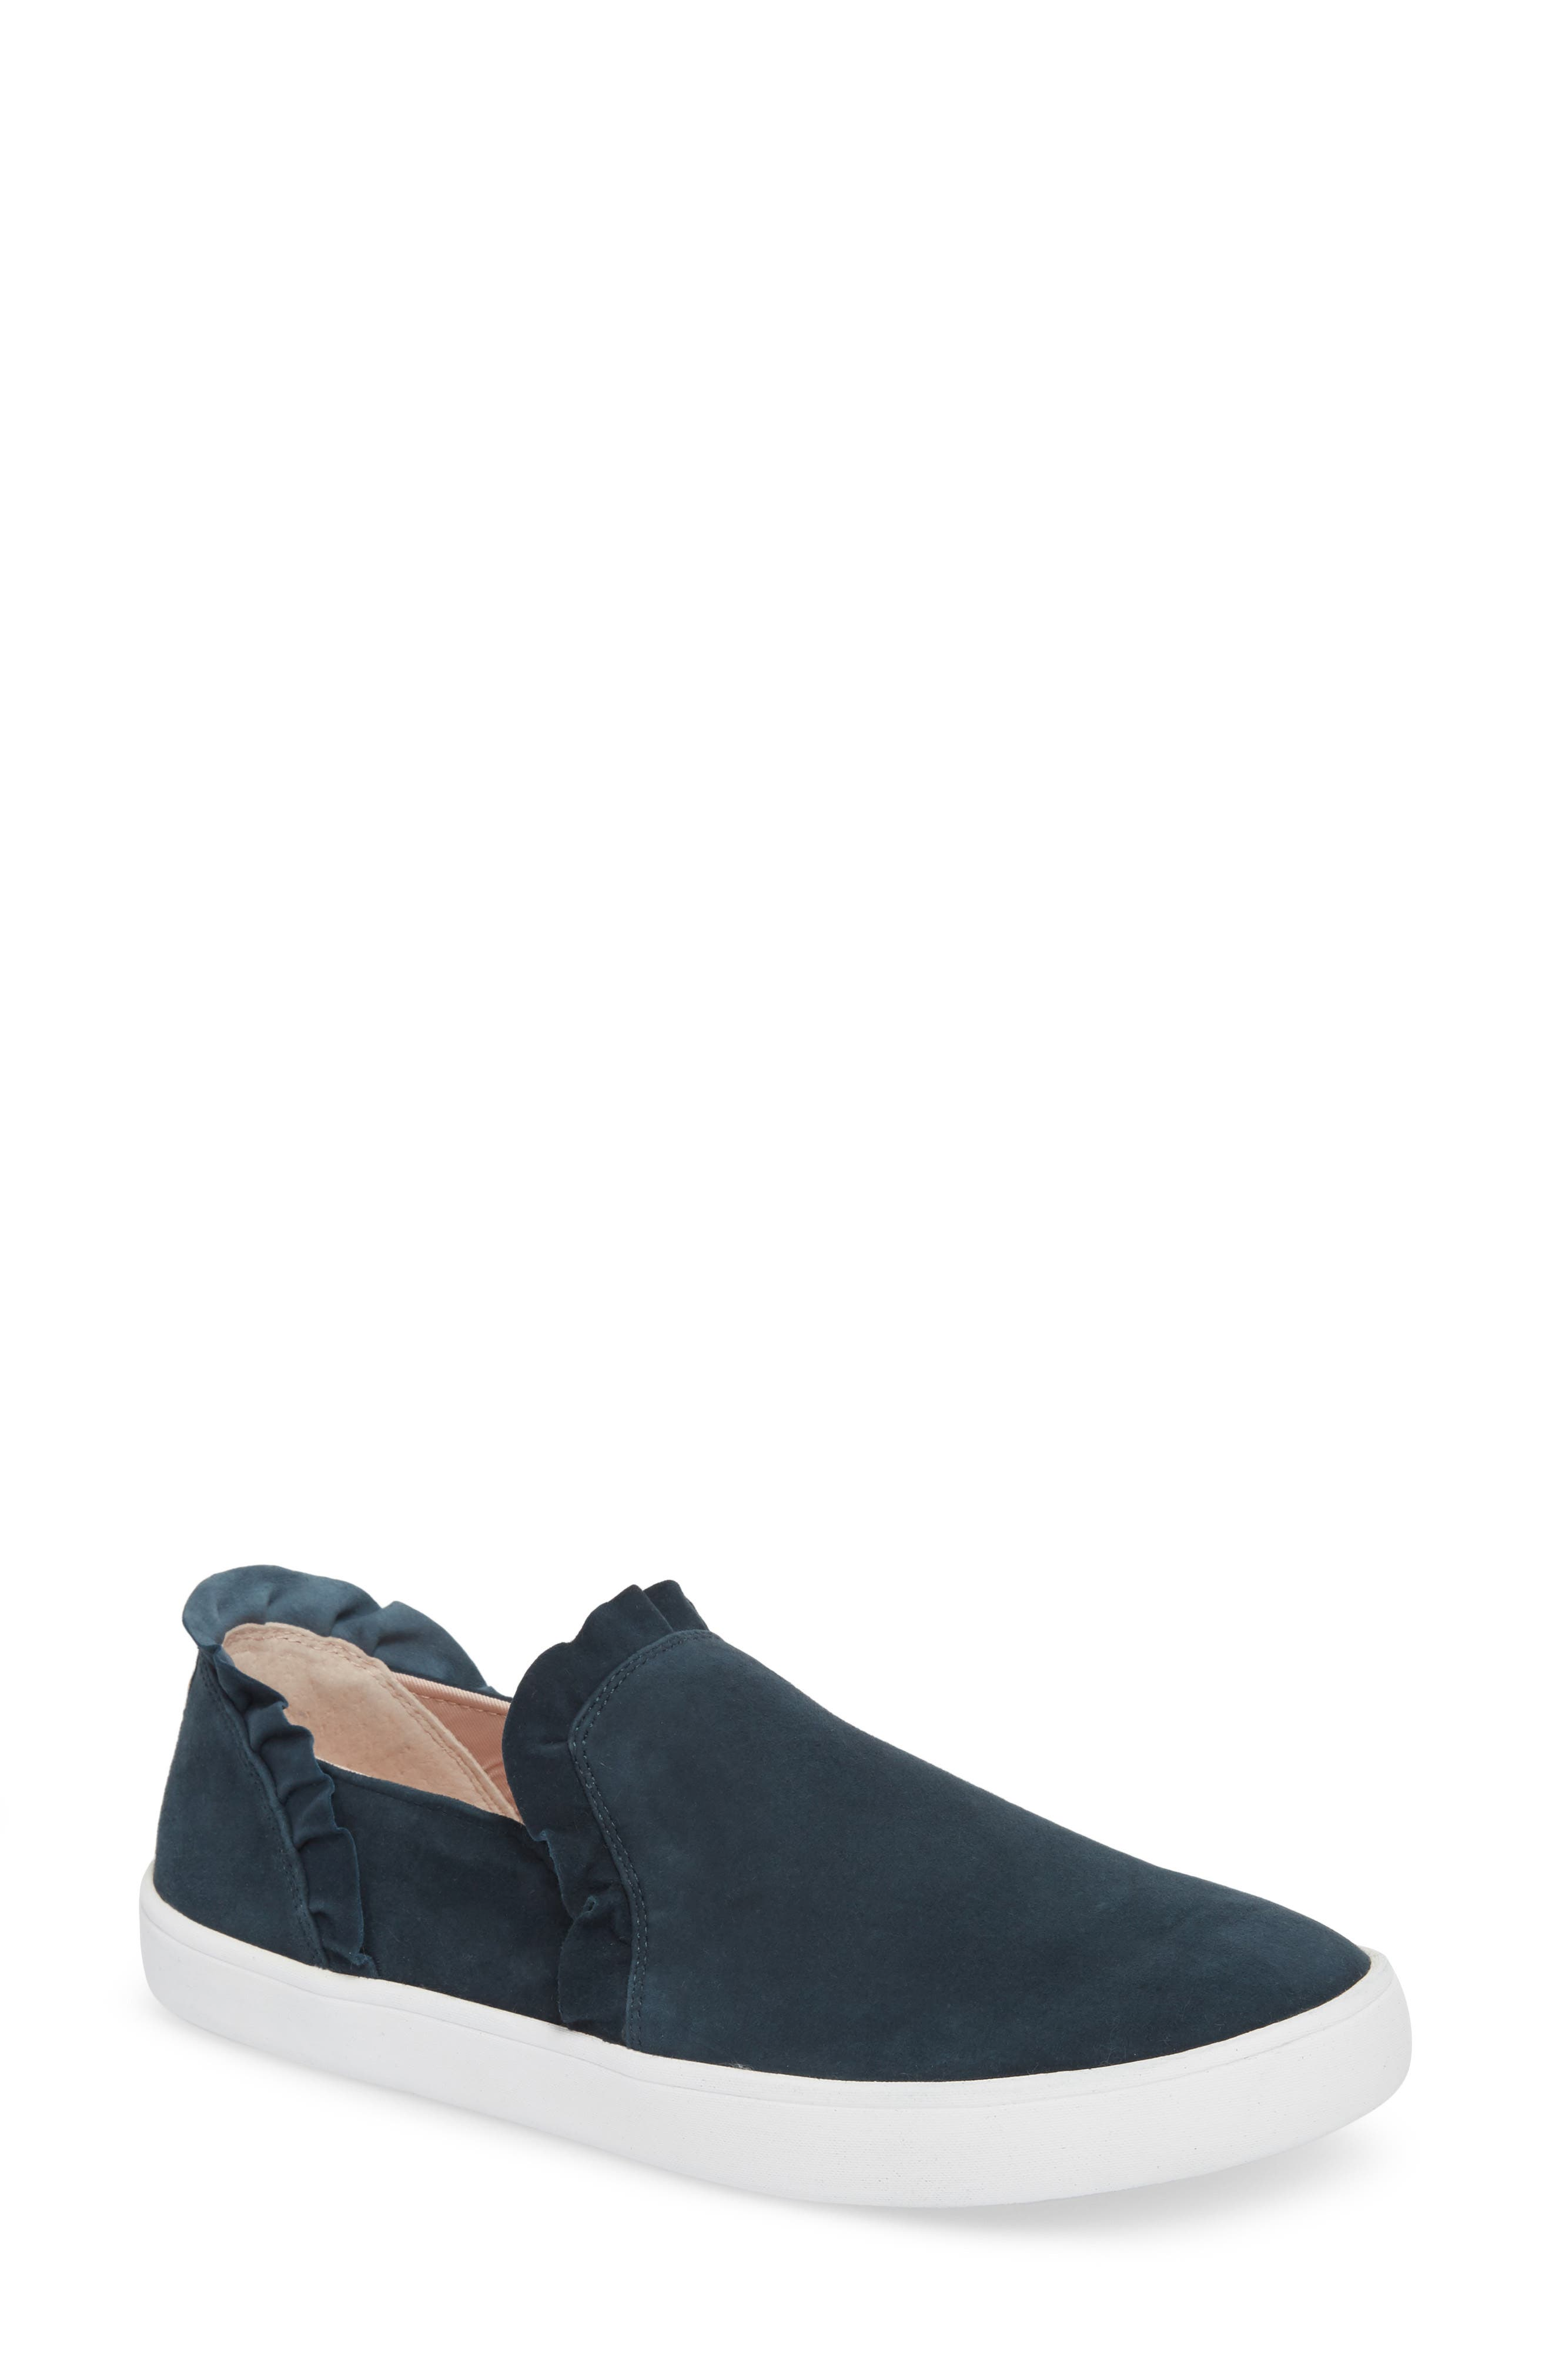 lilly ruffle slip-on sneaker,                             Main thumbnail 1, color,                             Navy